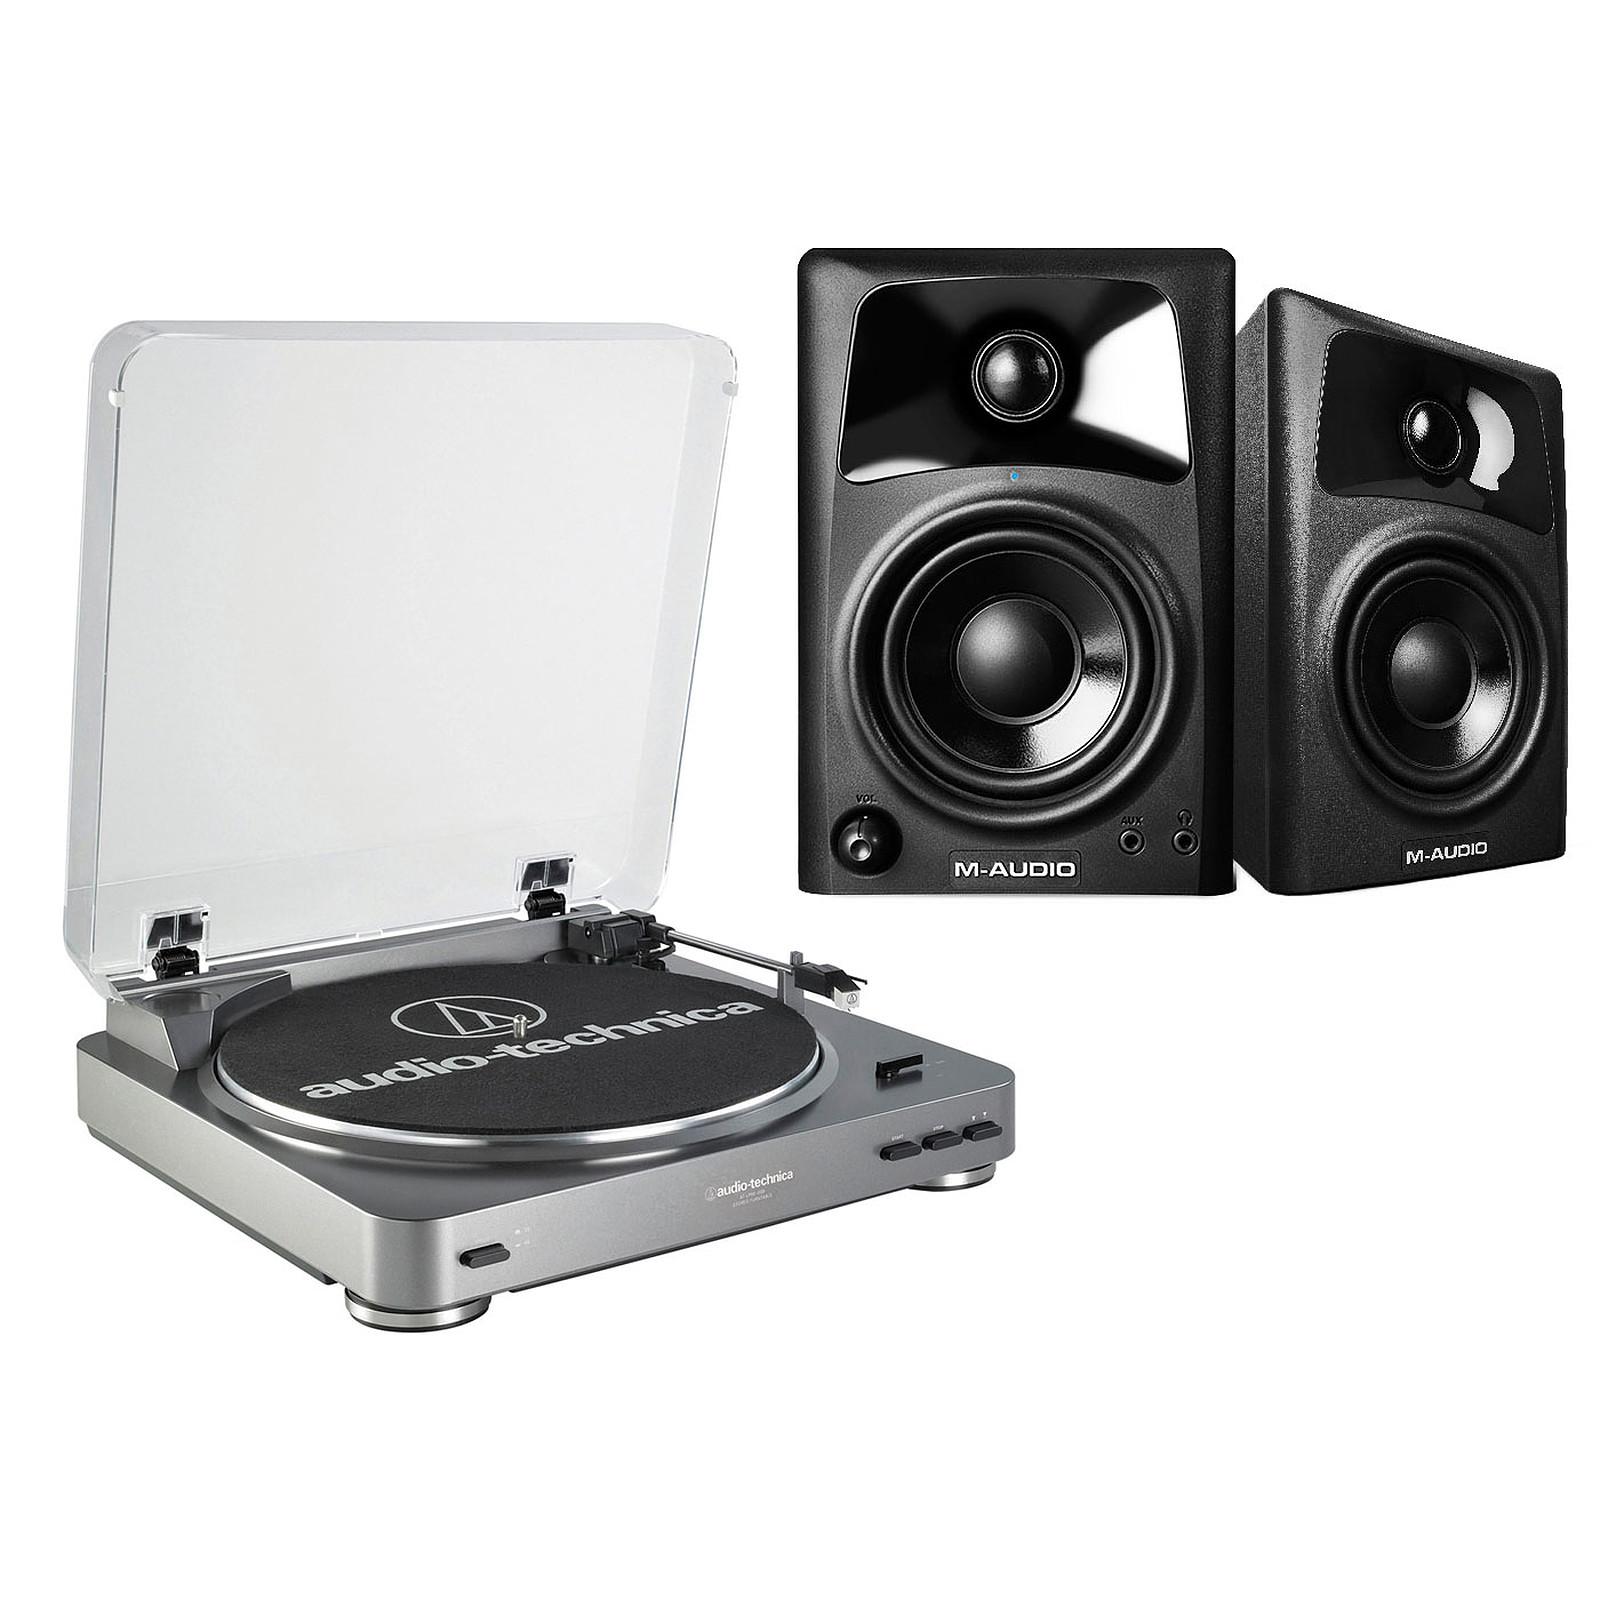 Audio-Technica AT-LP60USB + M-Audio AV 32